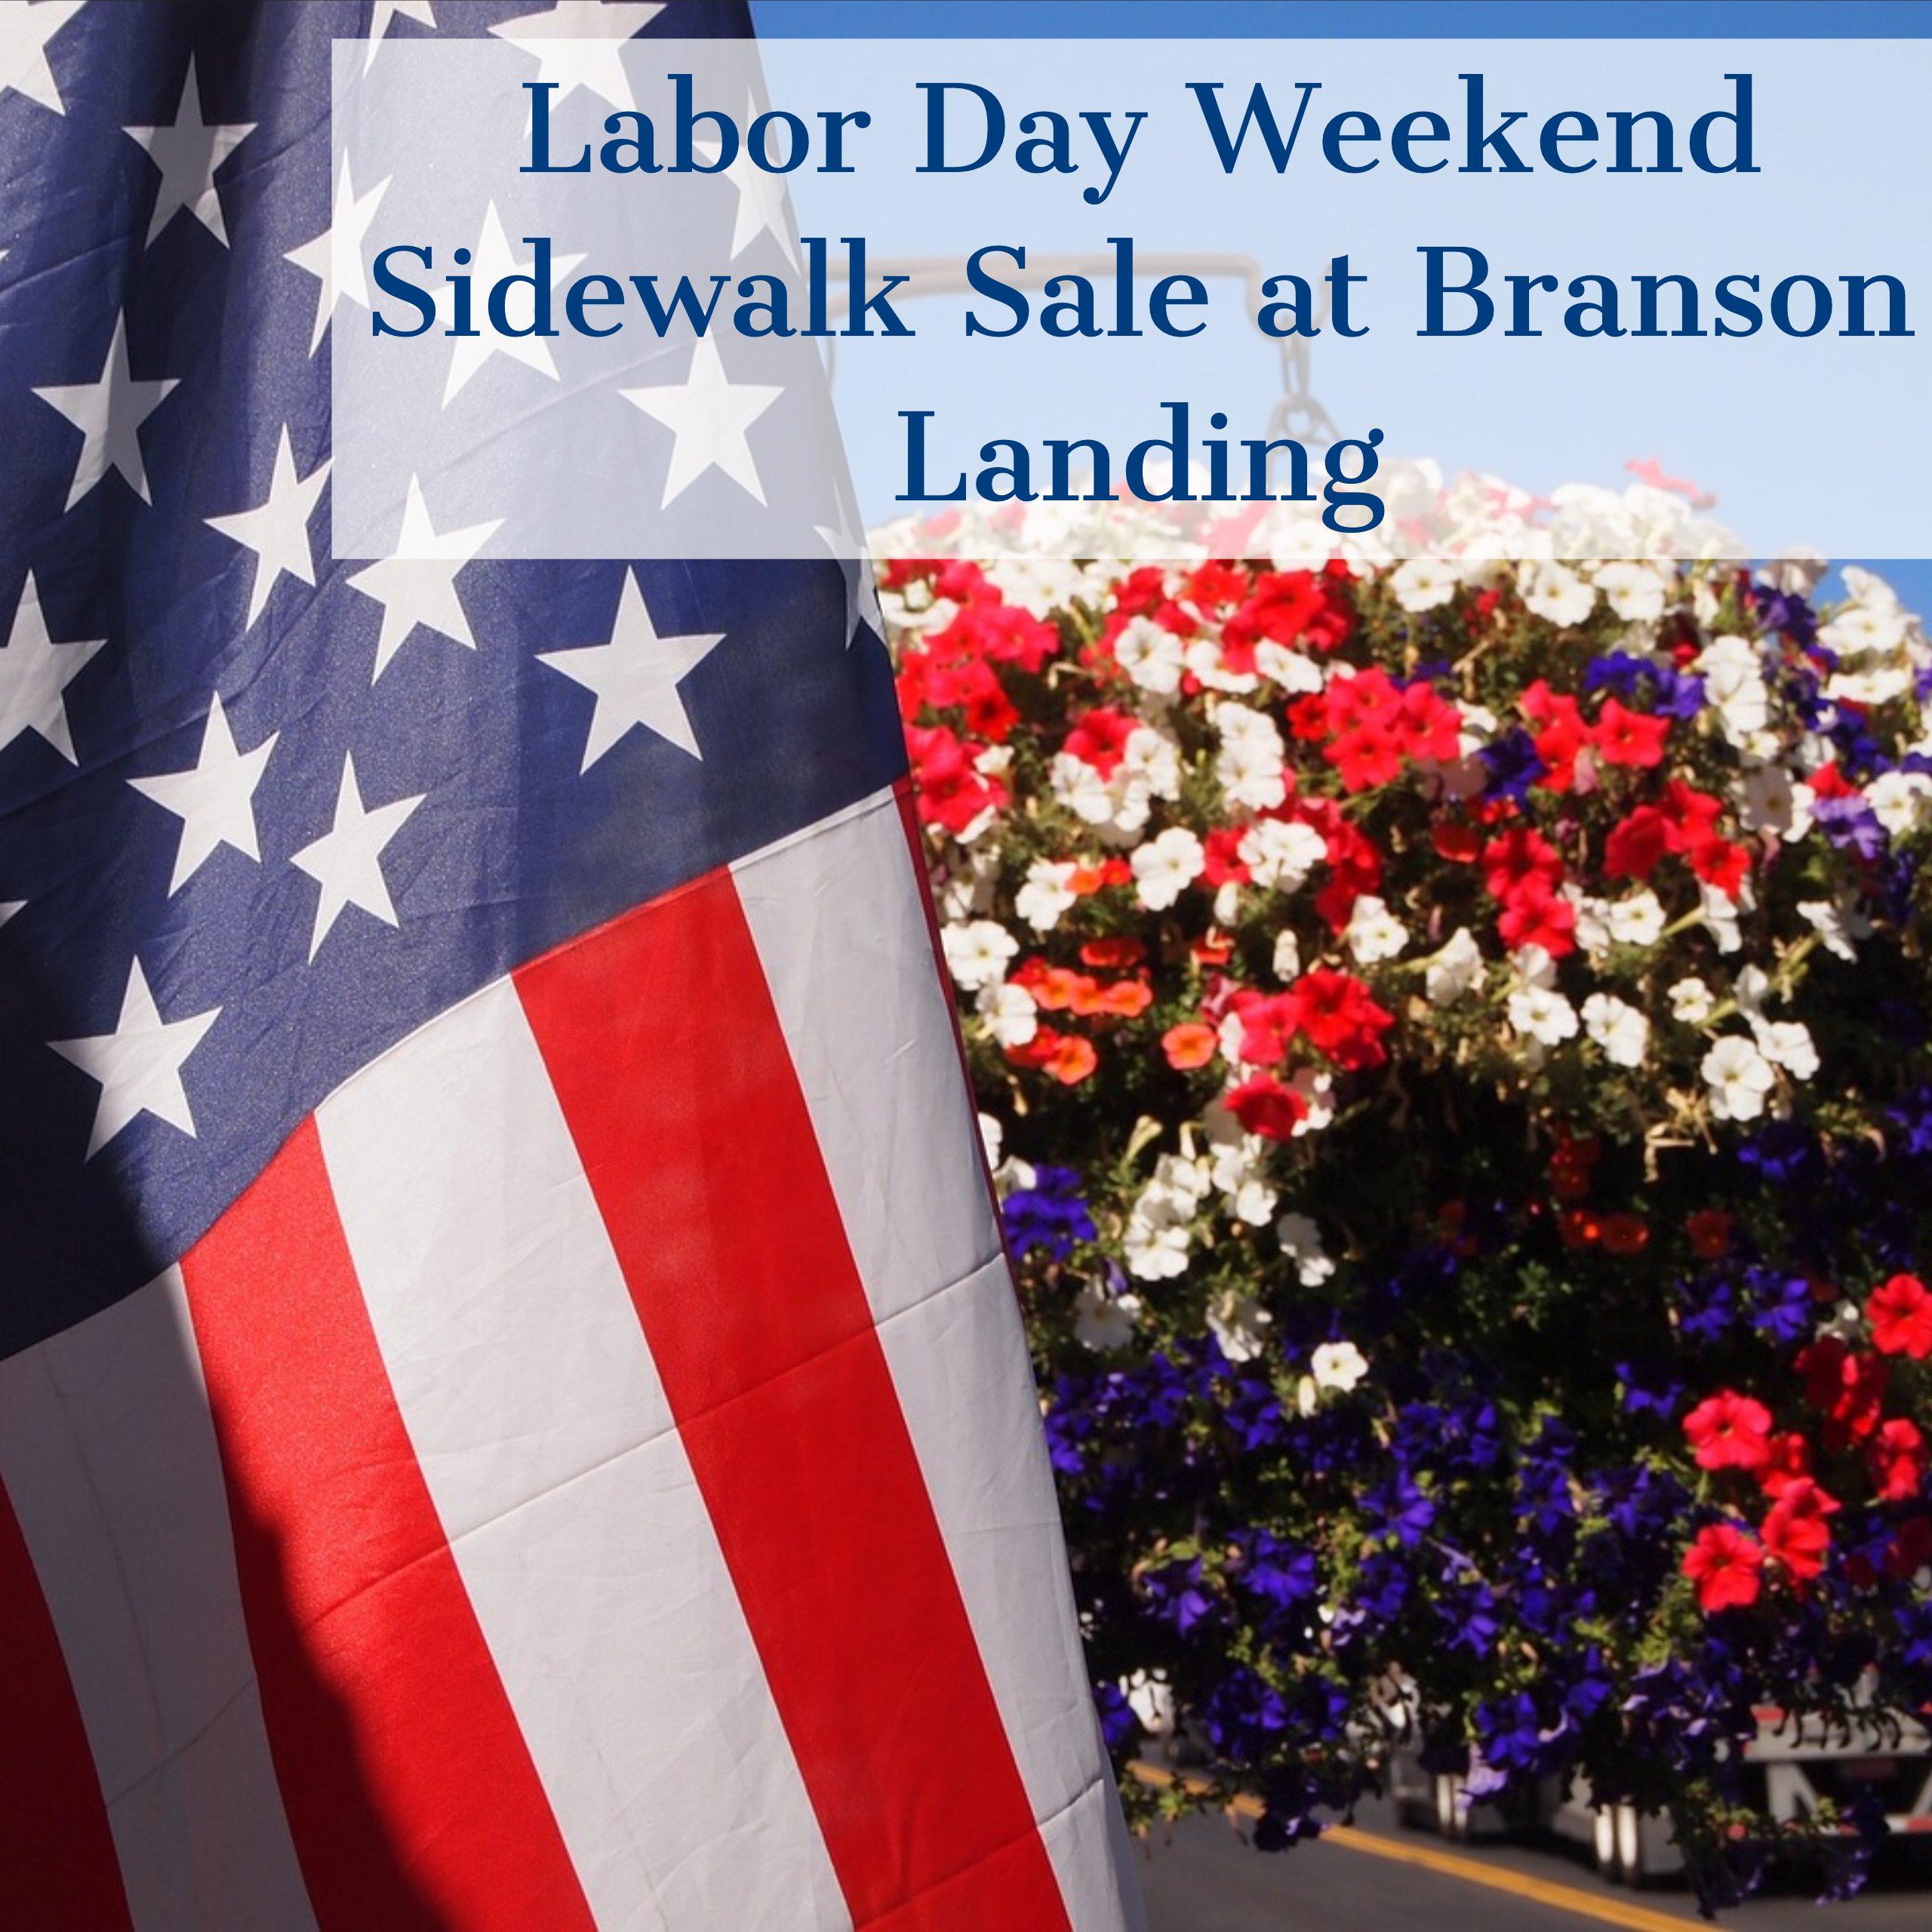 Labor Day Sidewalk Sale at The Branson Landing in Branson, MO